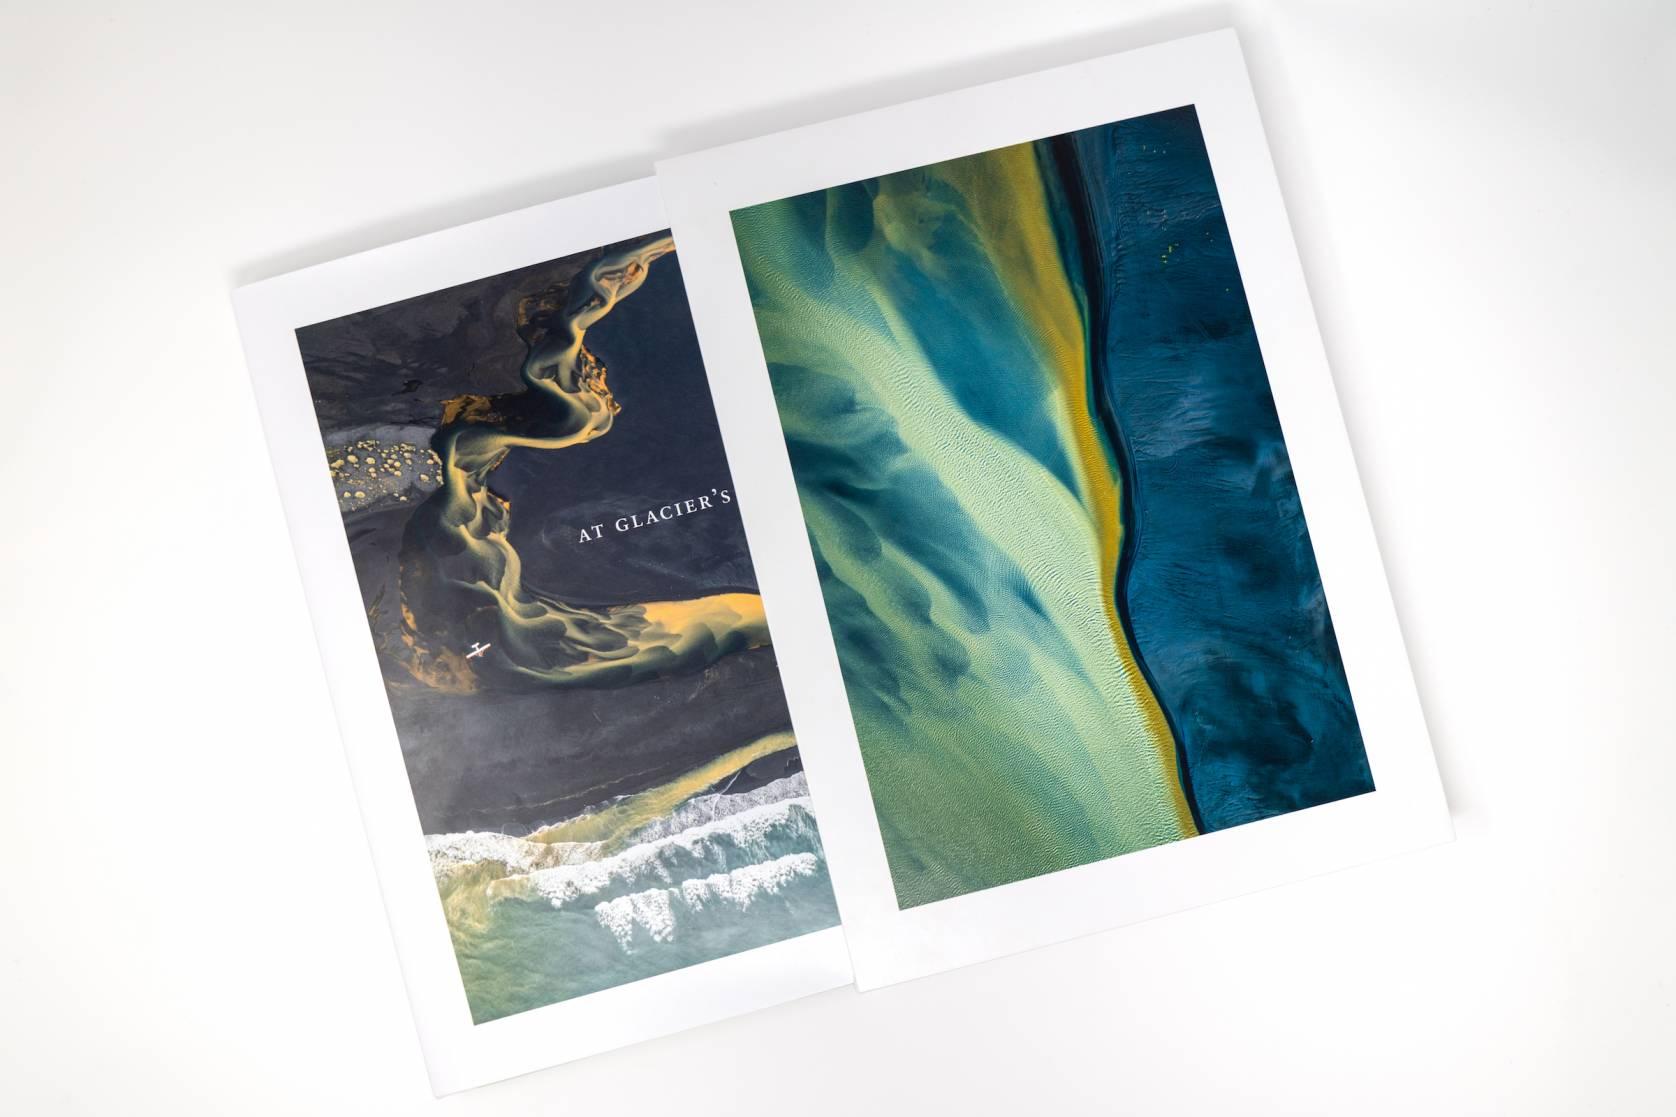 Chris Burkard Glaciers book